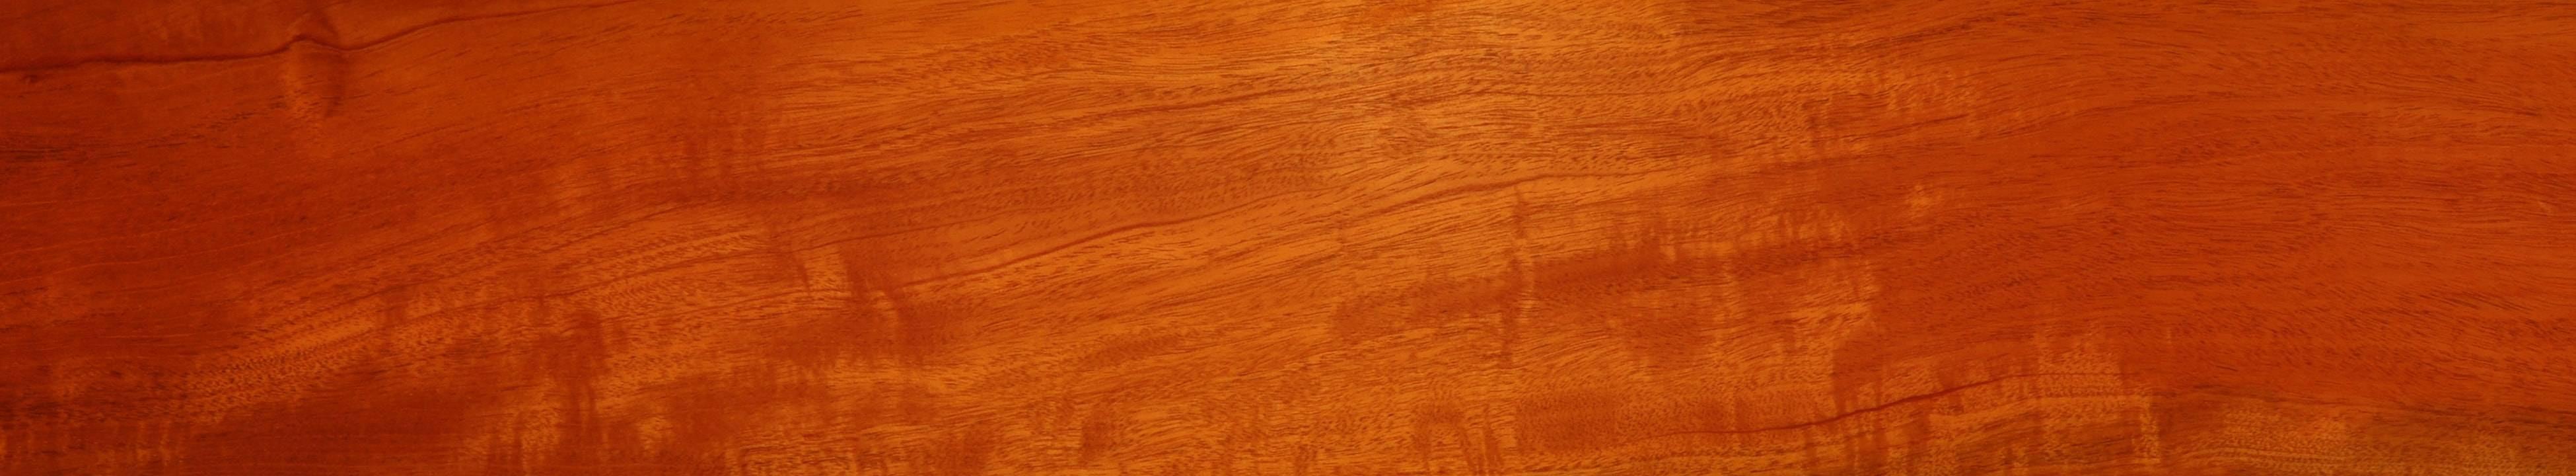 Genuine Mahogany (CITES II) - North American Hardwood ...